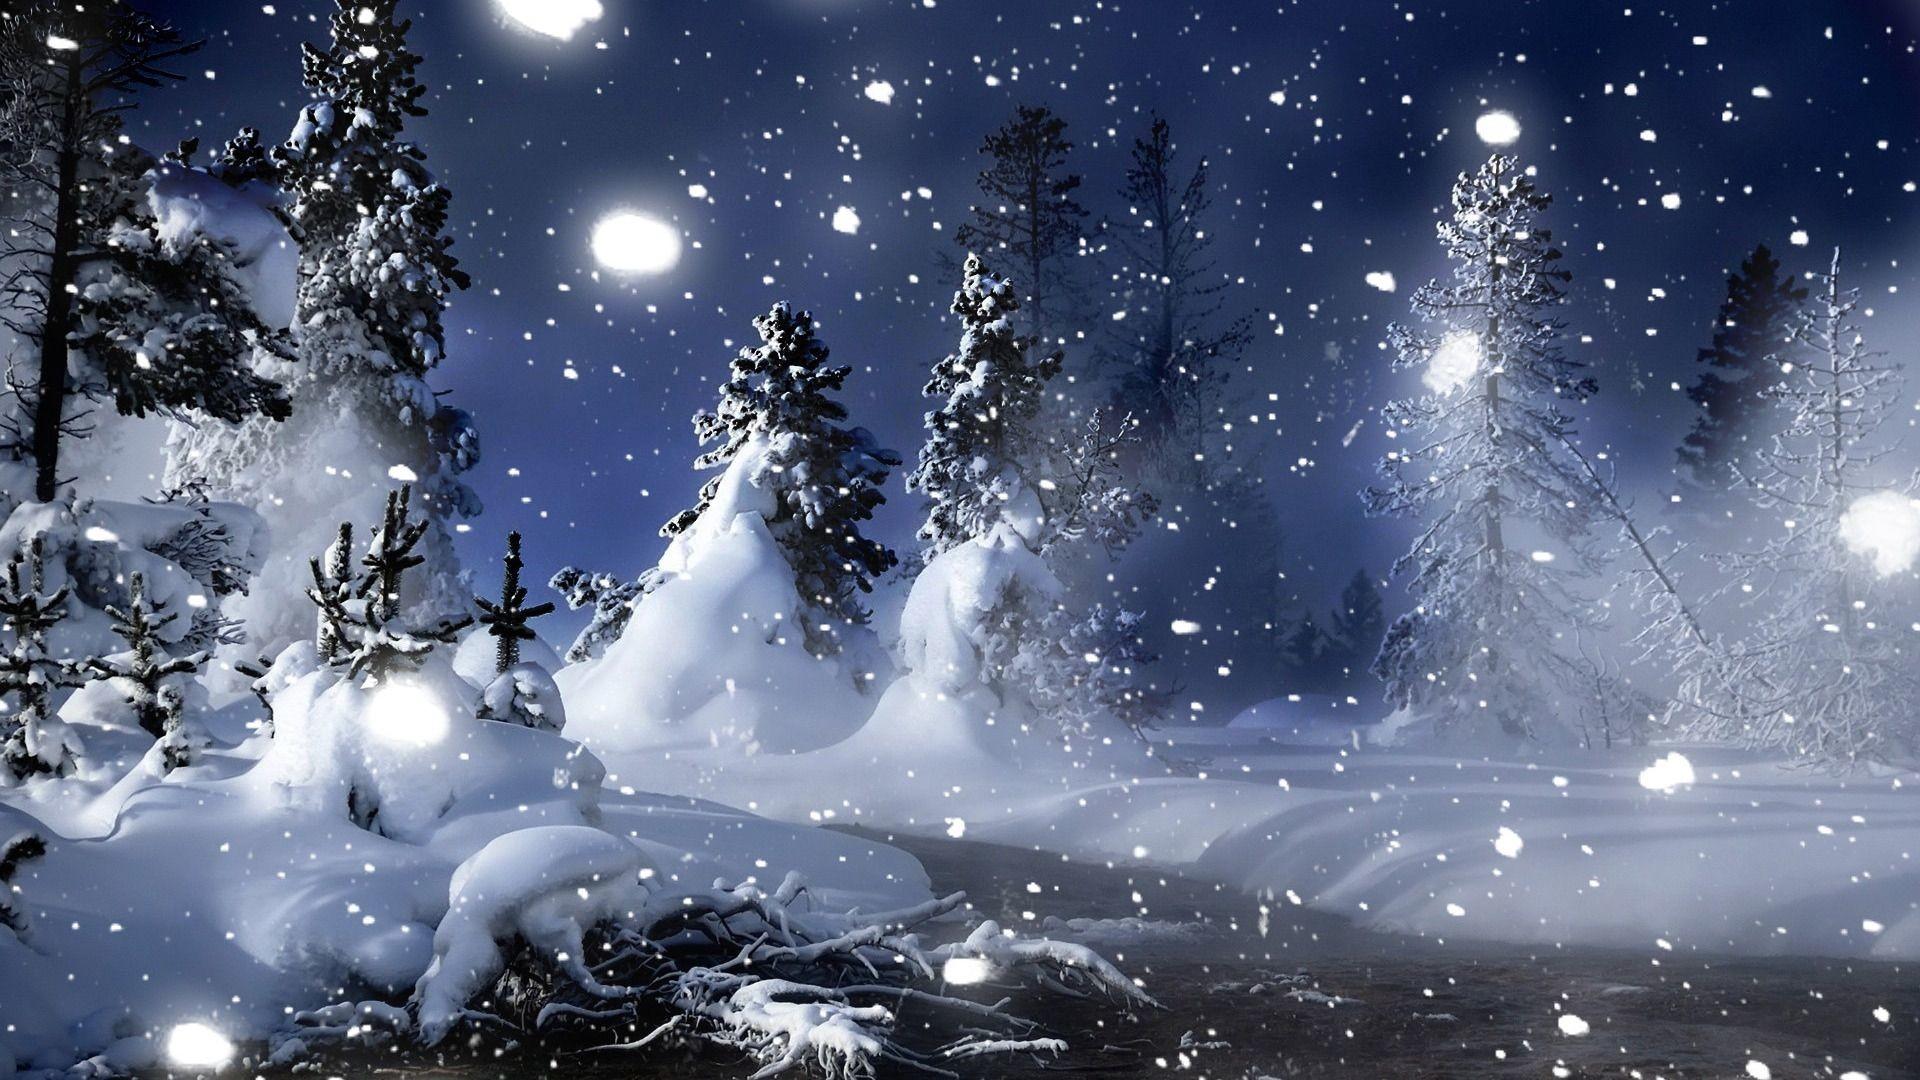 Download Wallpaper High Quality Winter - 609828  Photograph_274025.jpg